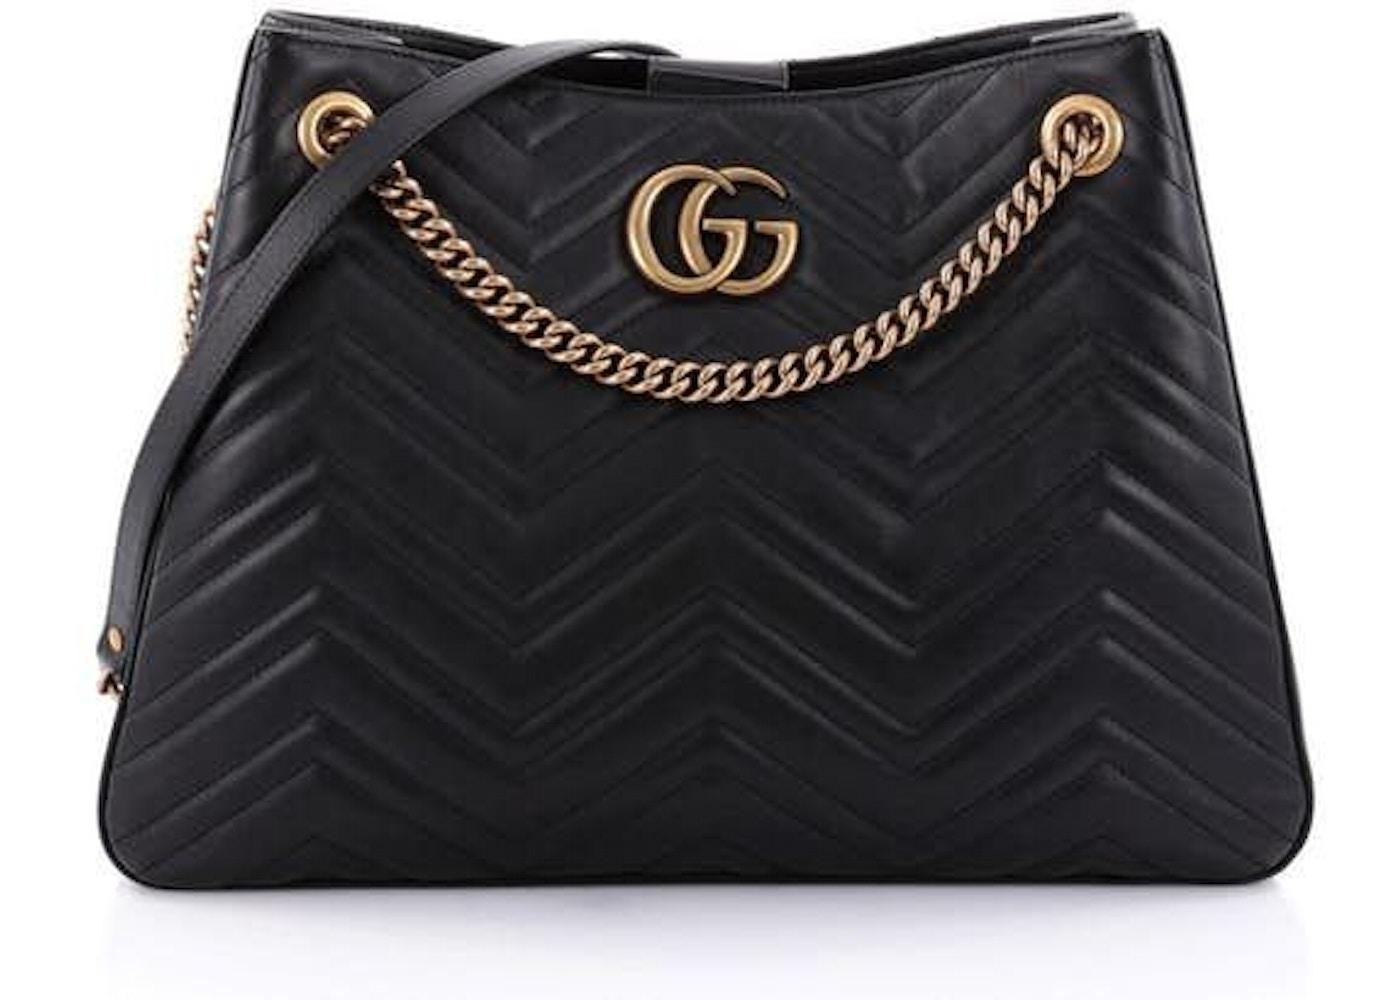 7e2c4c01f5f5 Buy & Sell Gucci Luxury Handbags